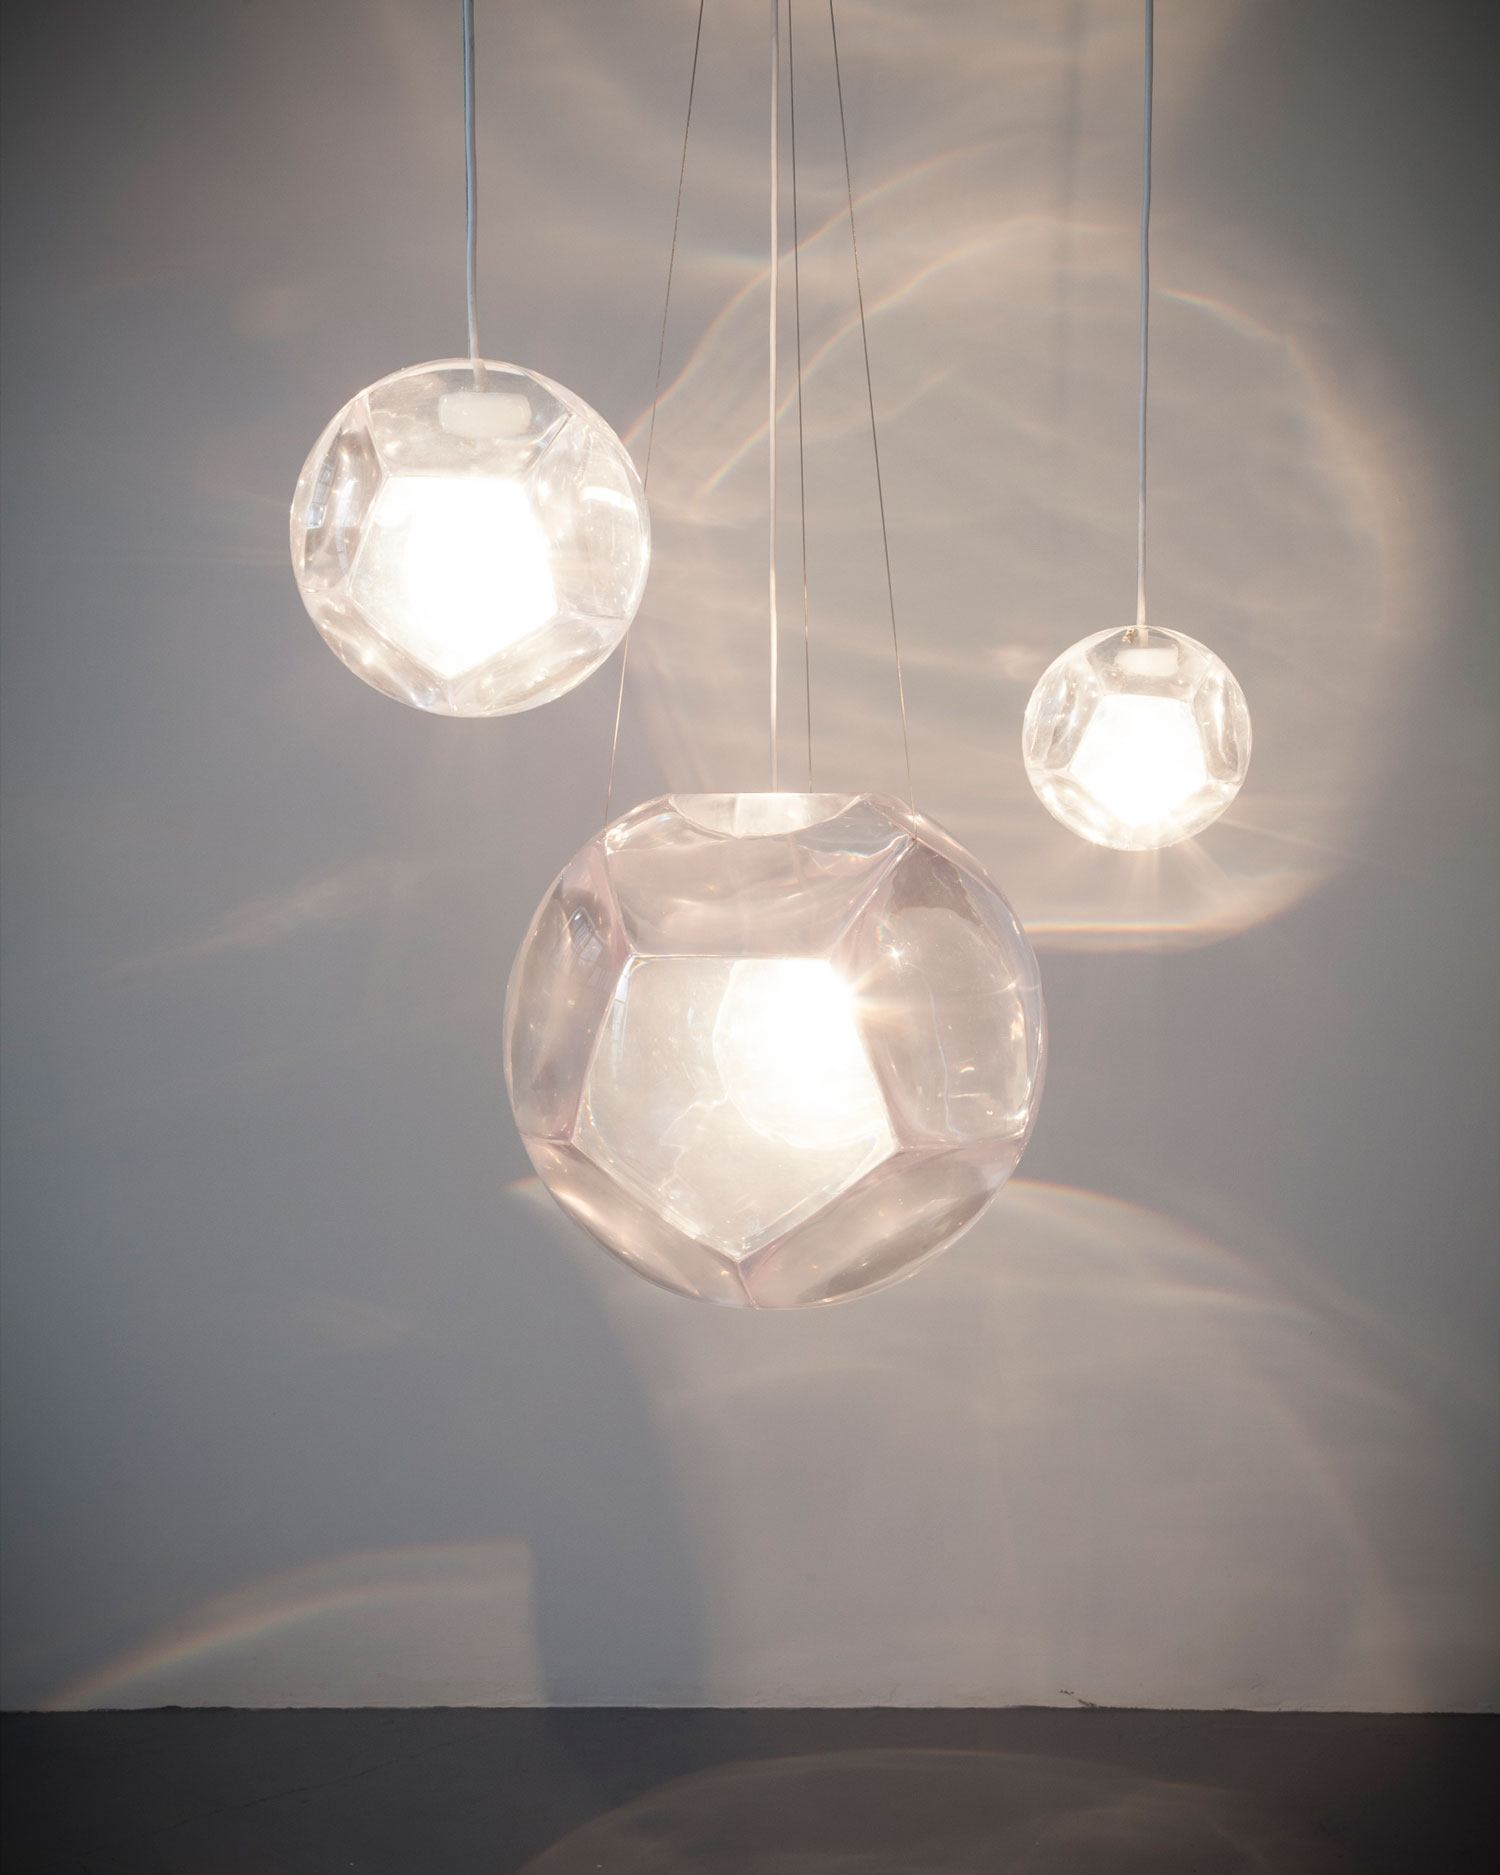 A chandelier designed by Christian Wassmann.